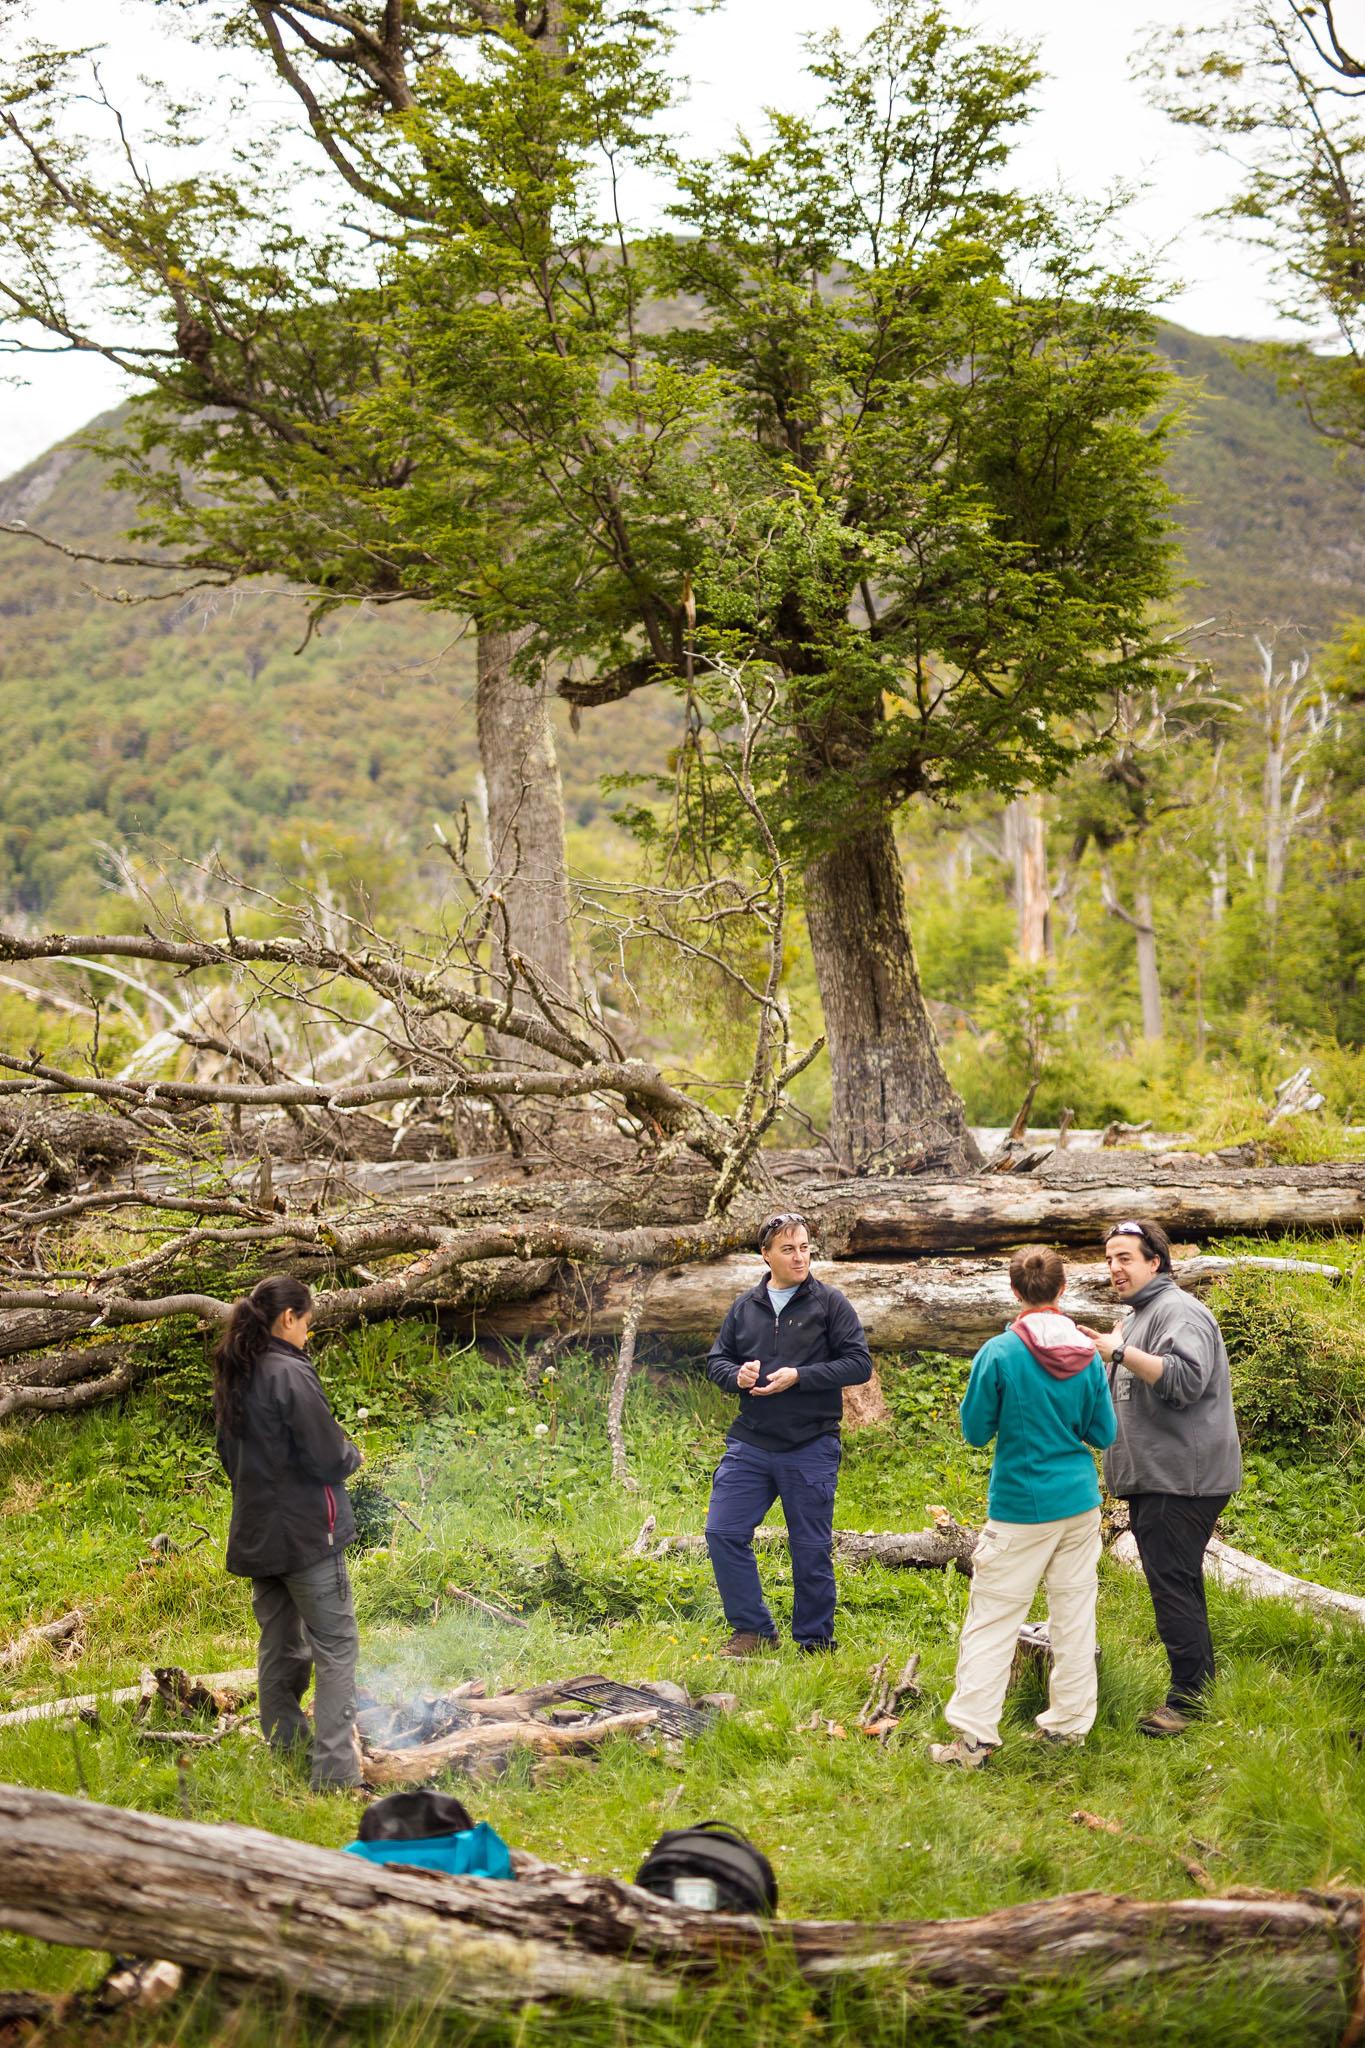 Wedding-travellers-ushuaia-argentina-asado-family-time